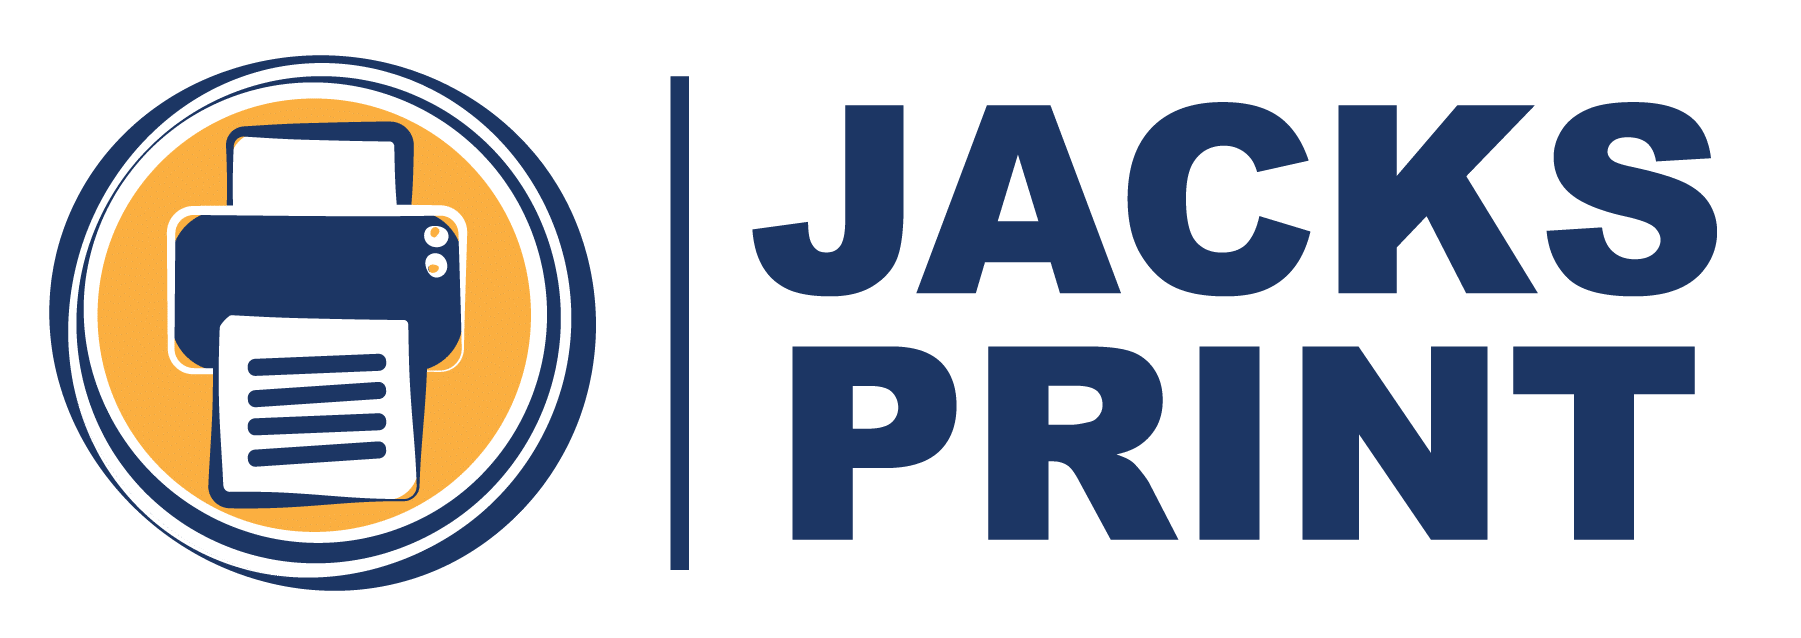 Jack Print logo